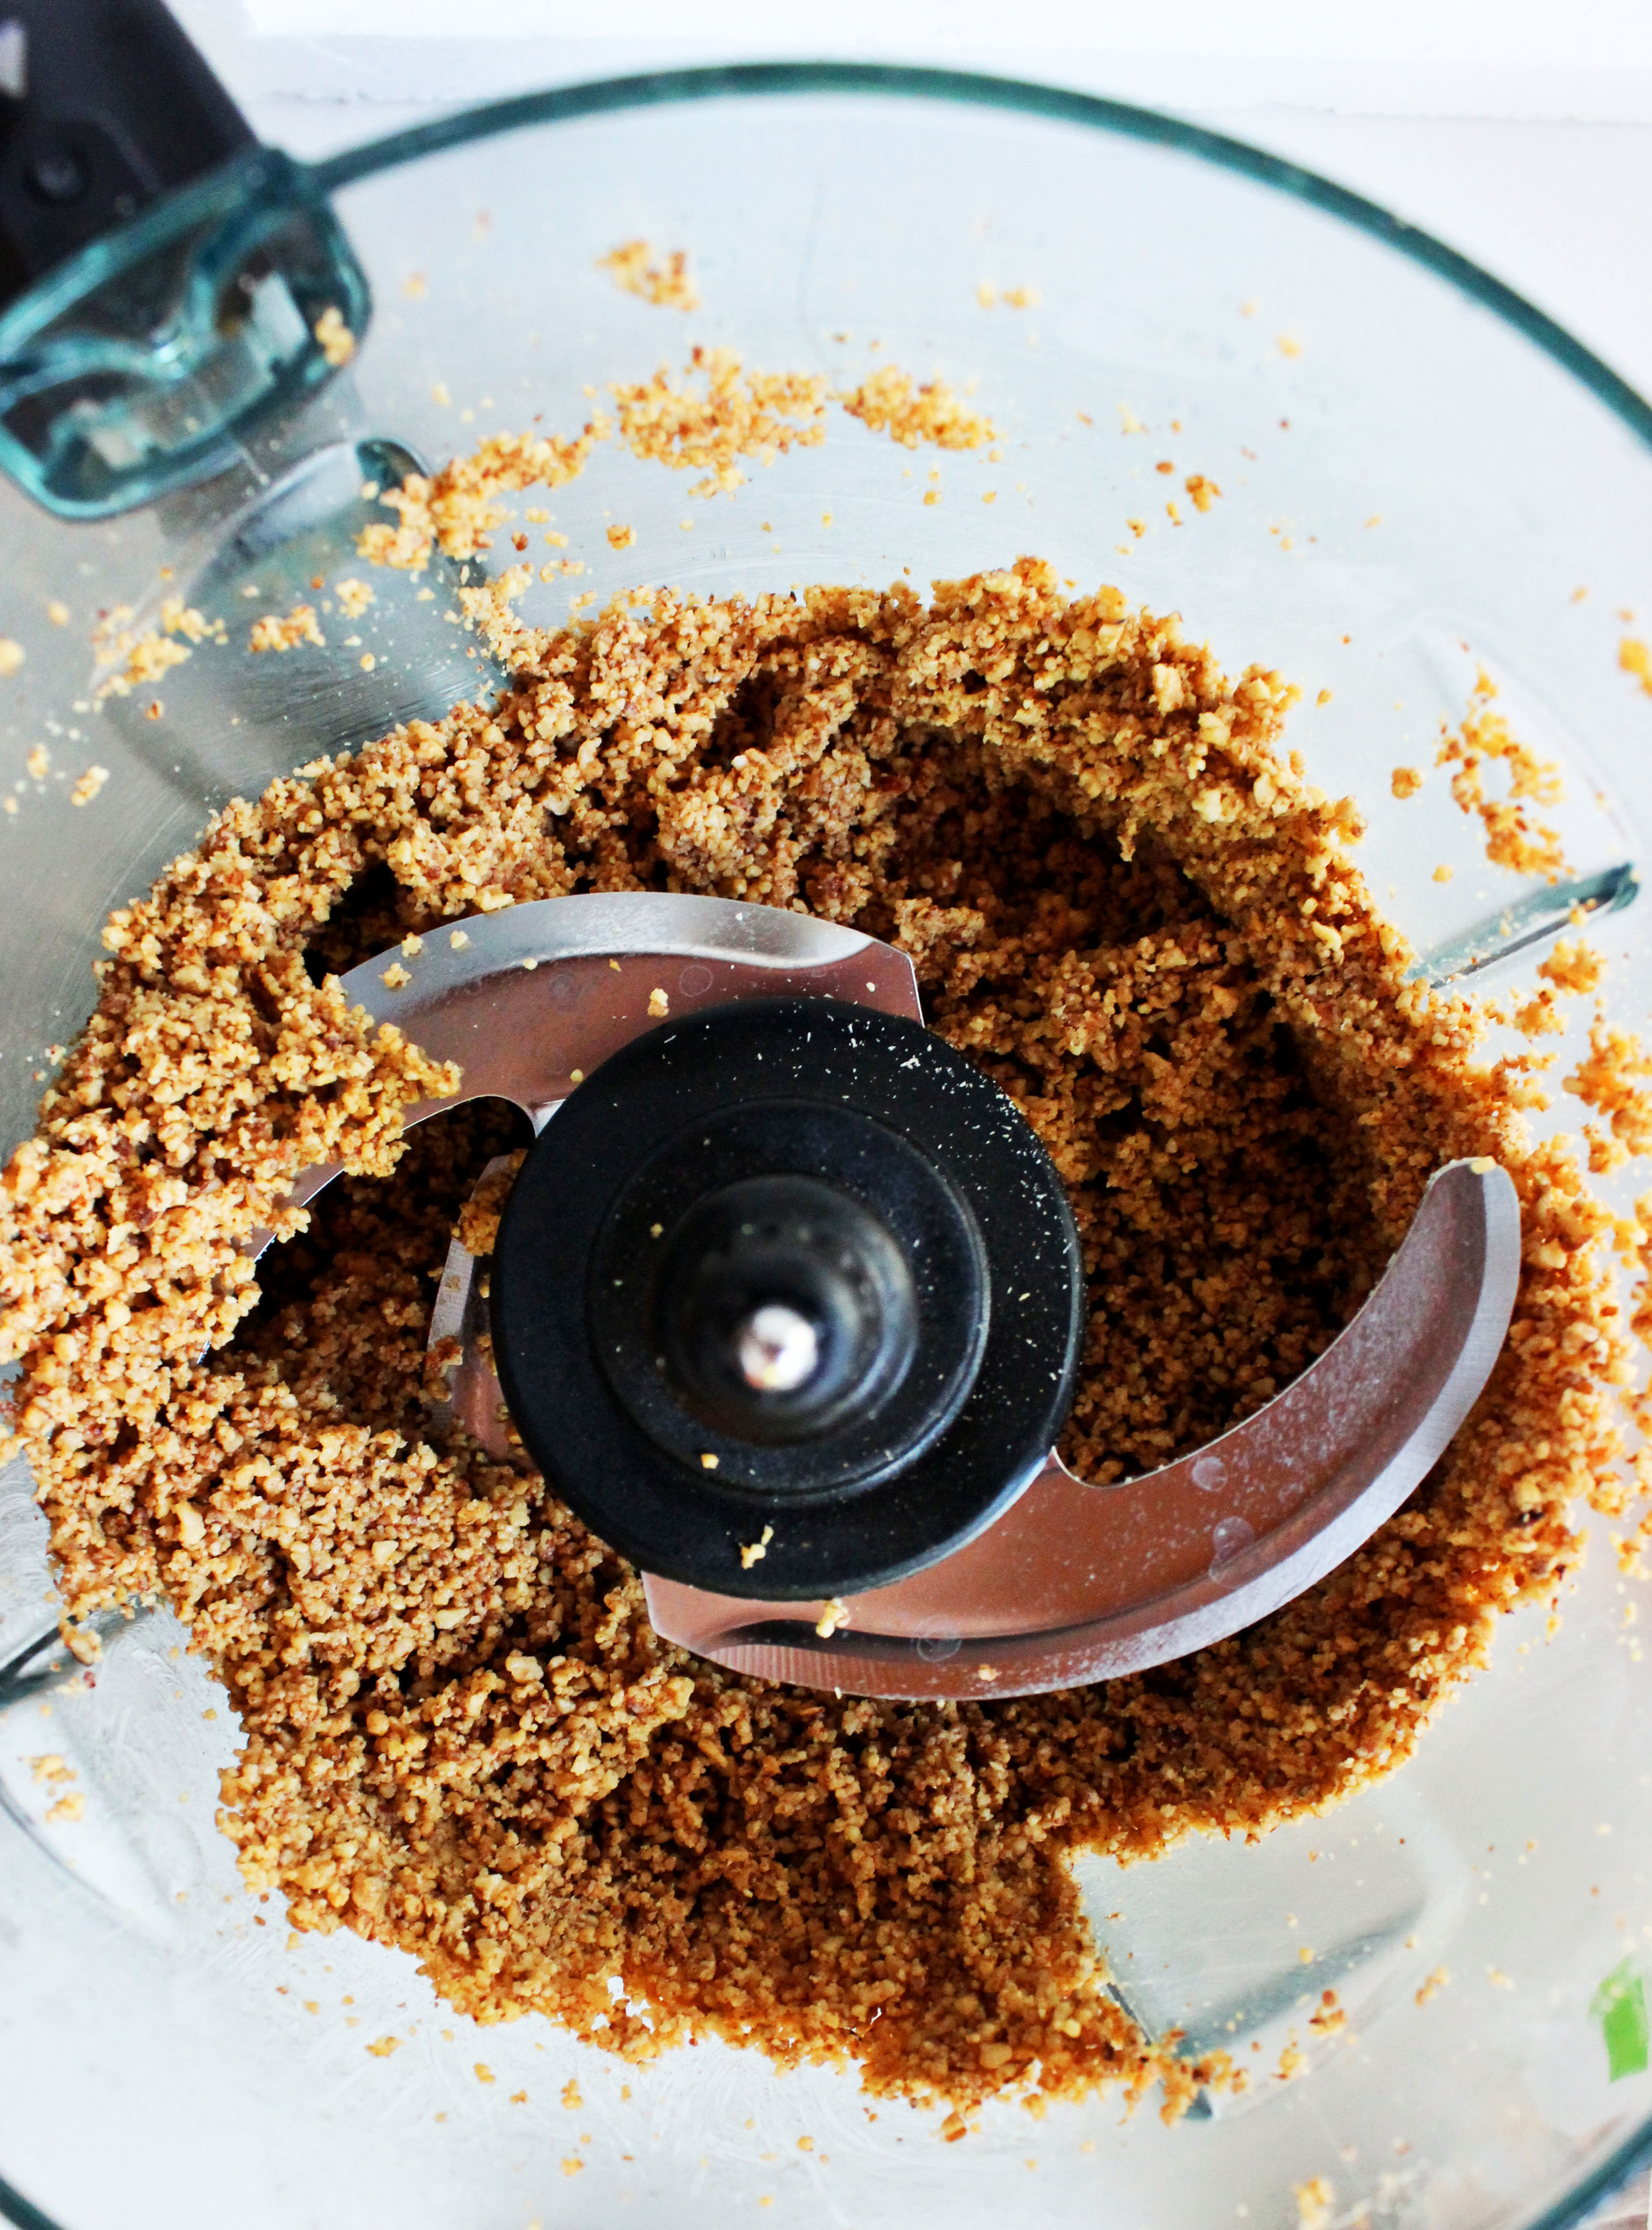 Cinnamon Vanilla Almond Butter (no sugar added) sweetdisasters.com